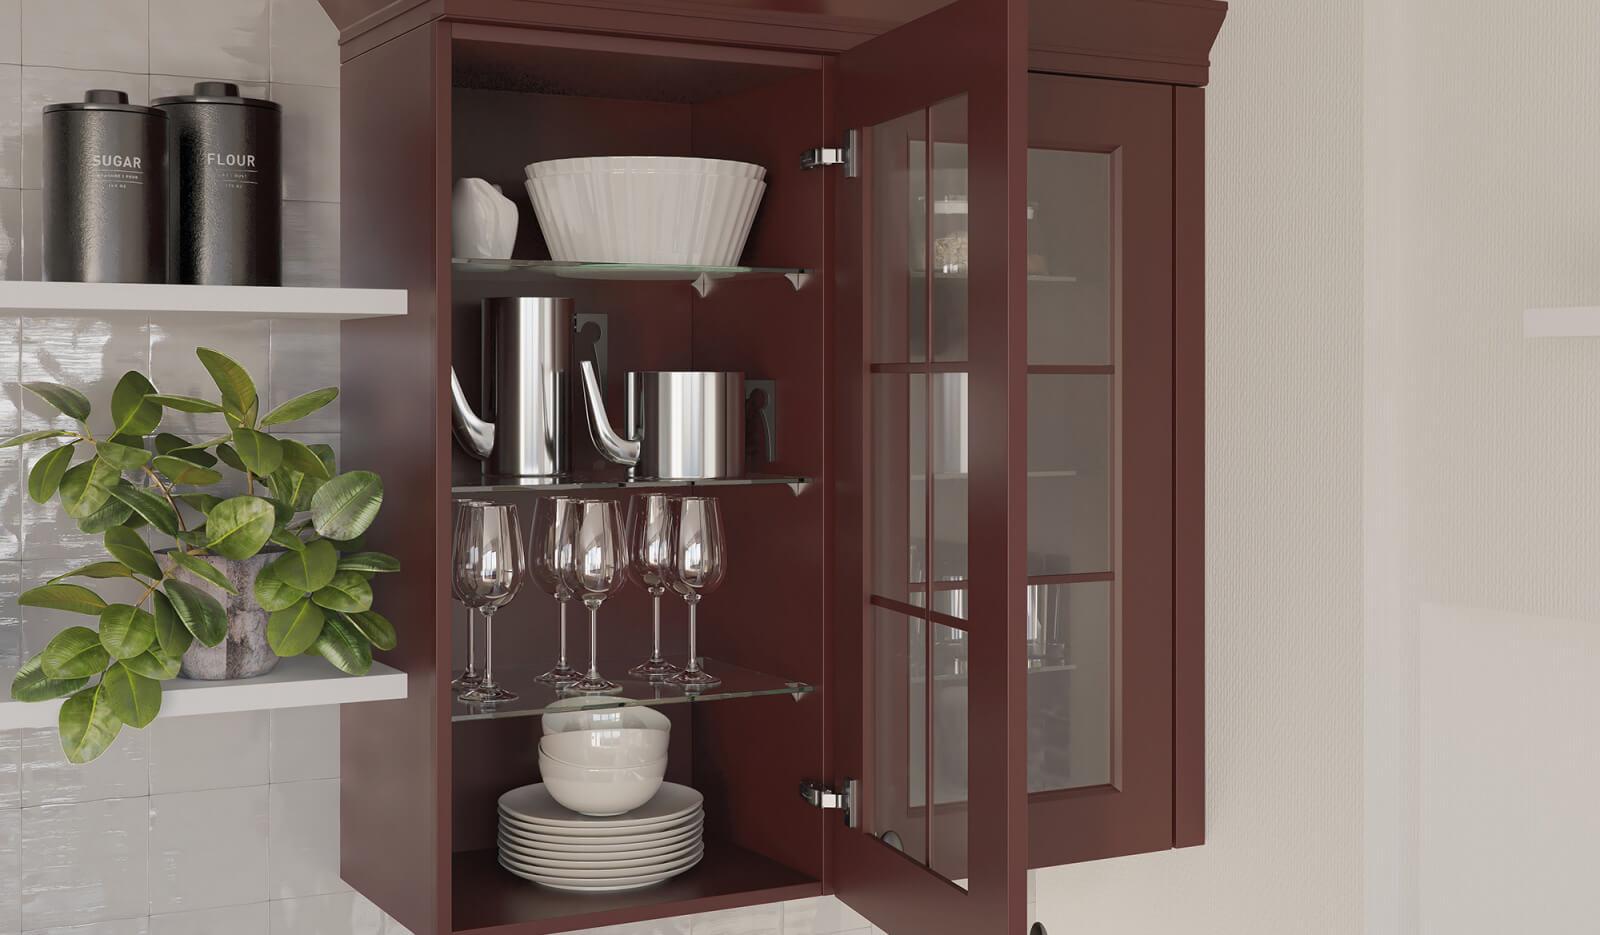 Keuken Rustiek robijnrood - bovenkast